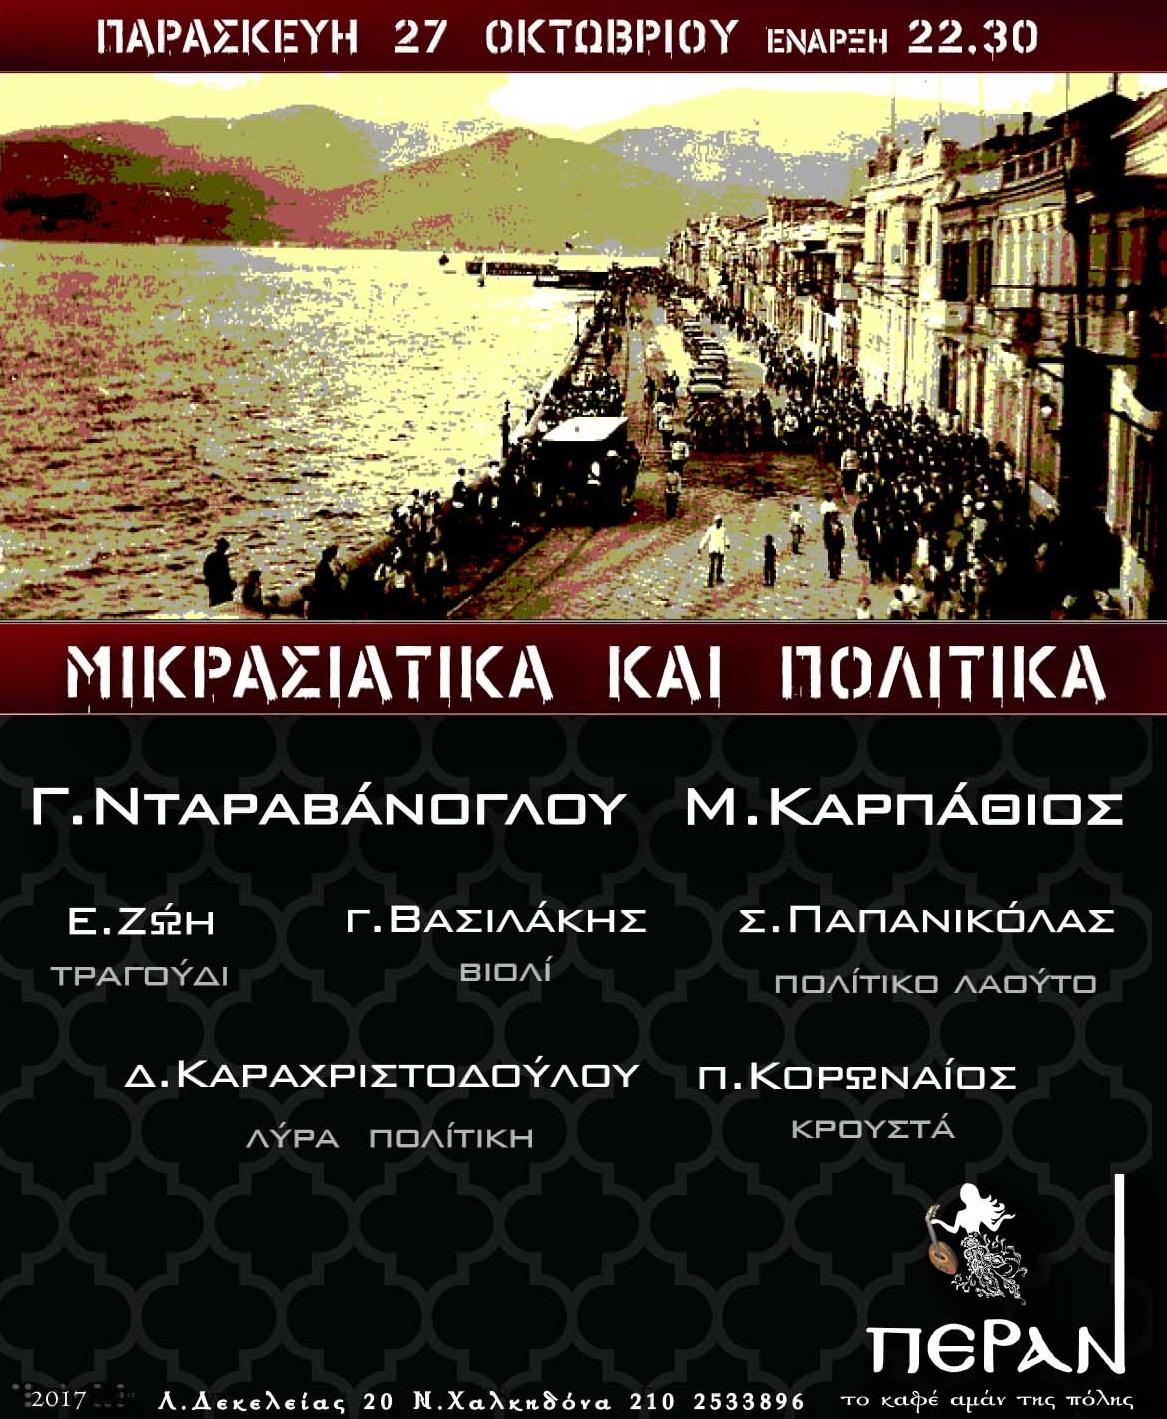 KARPATHIOS-NTARAVANOGLOU